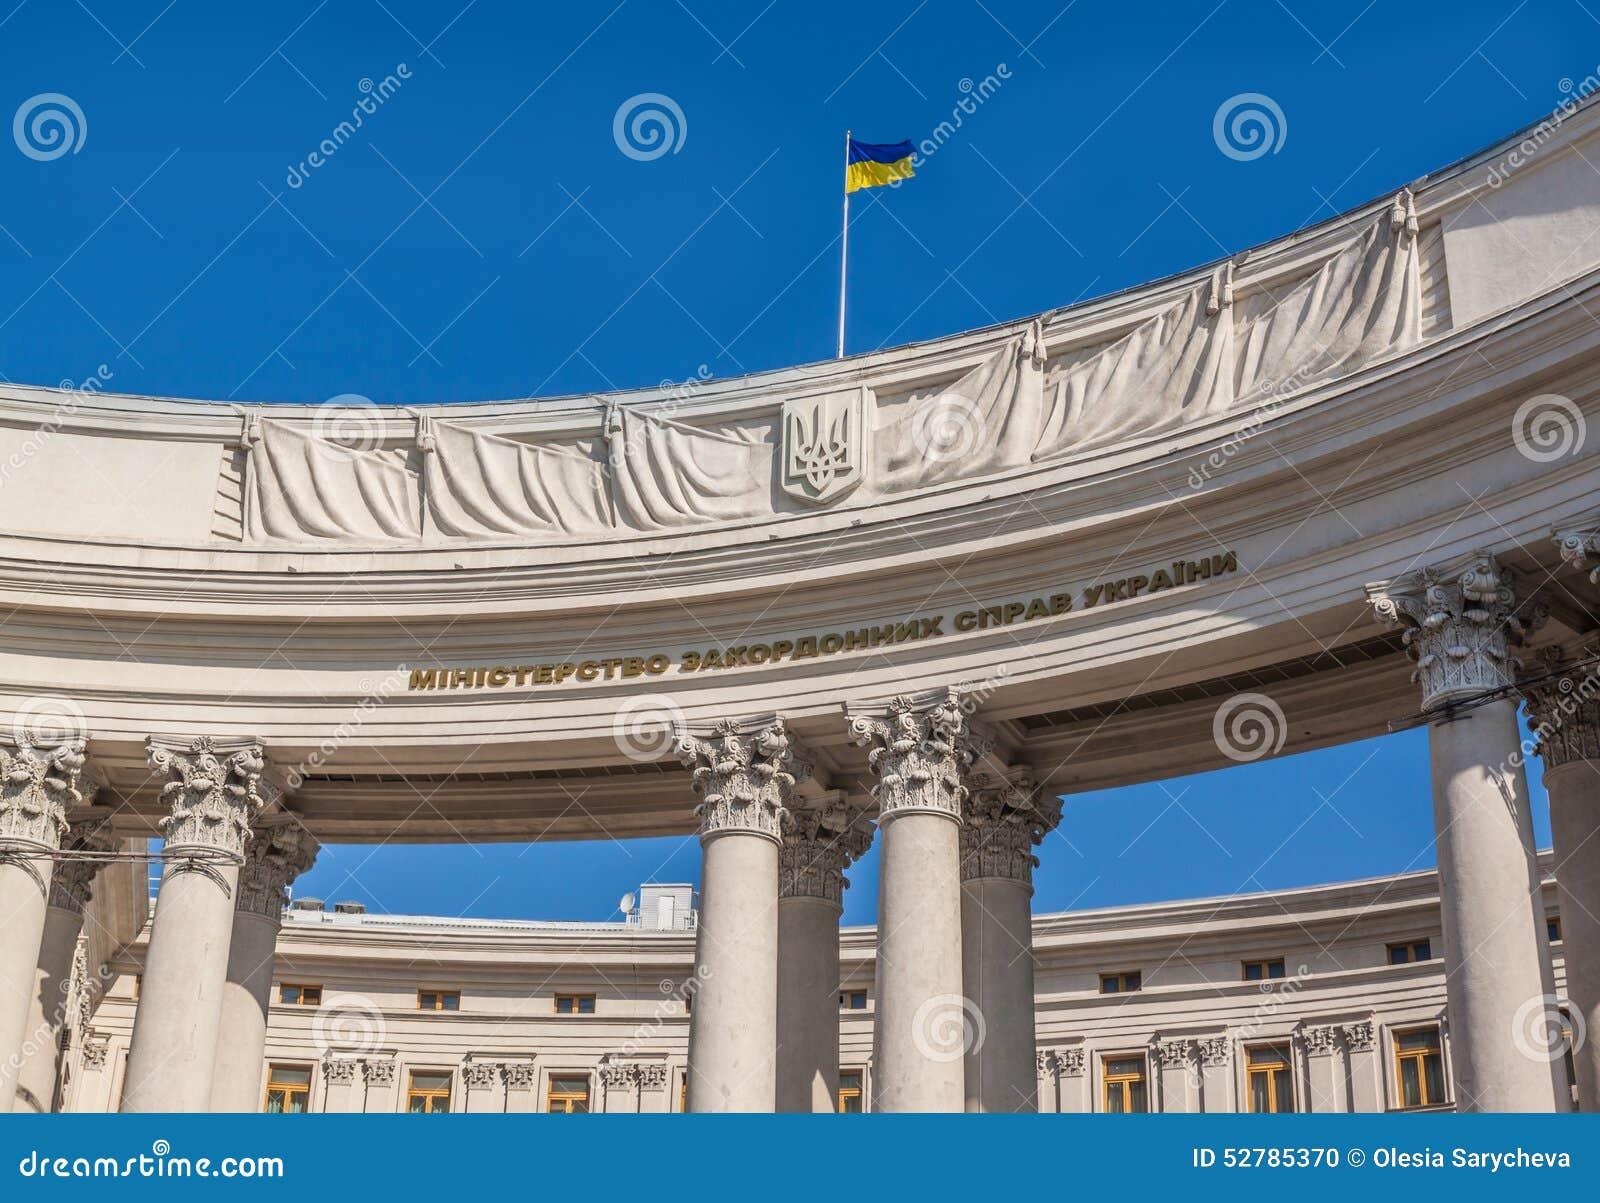 El Ministerio de Asuntos Exteriores de Kiev, Ucrania